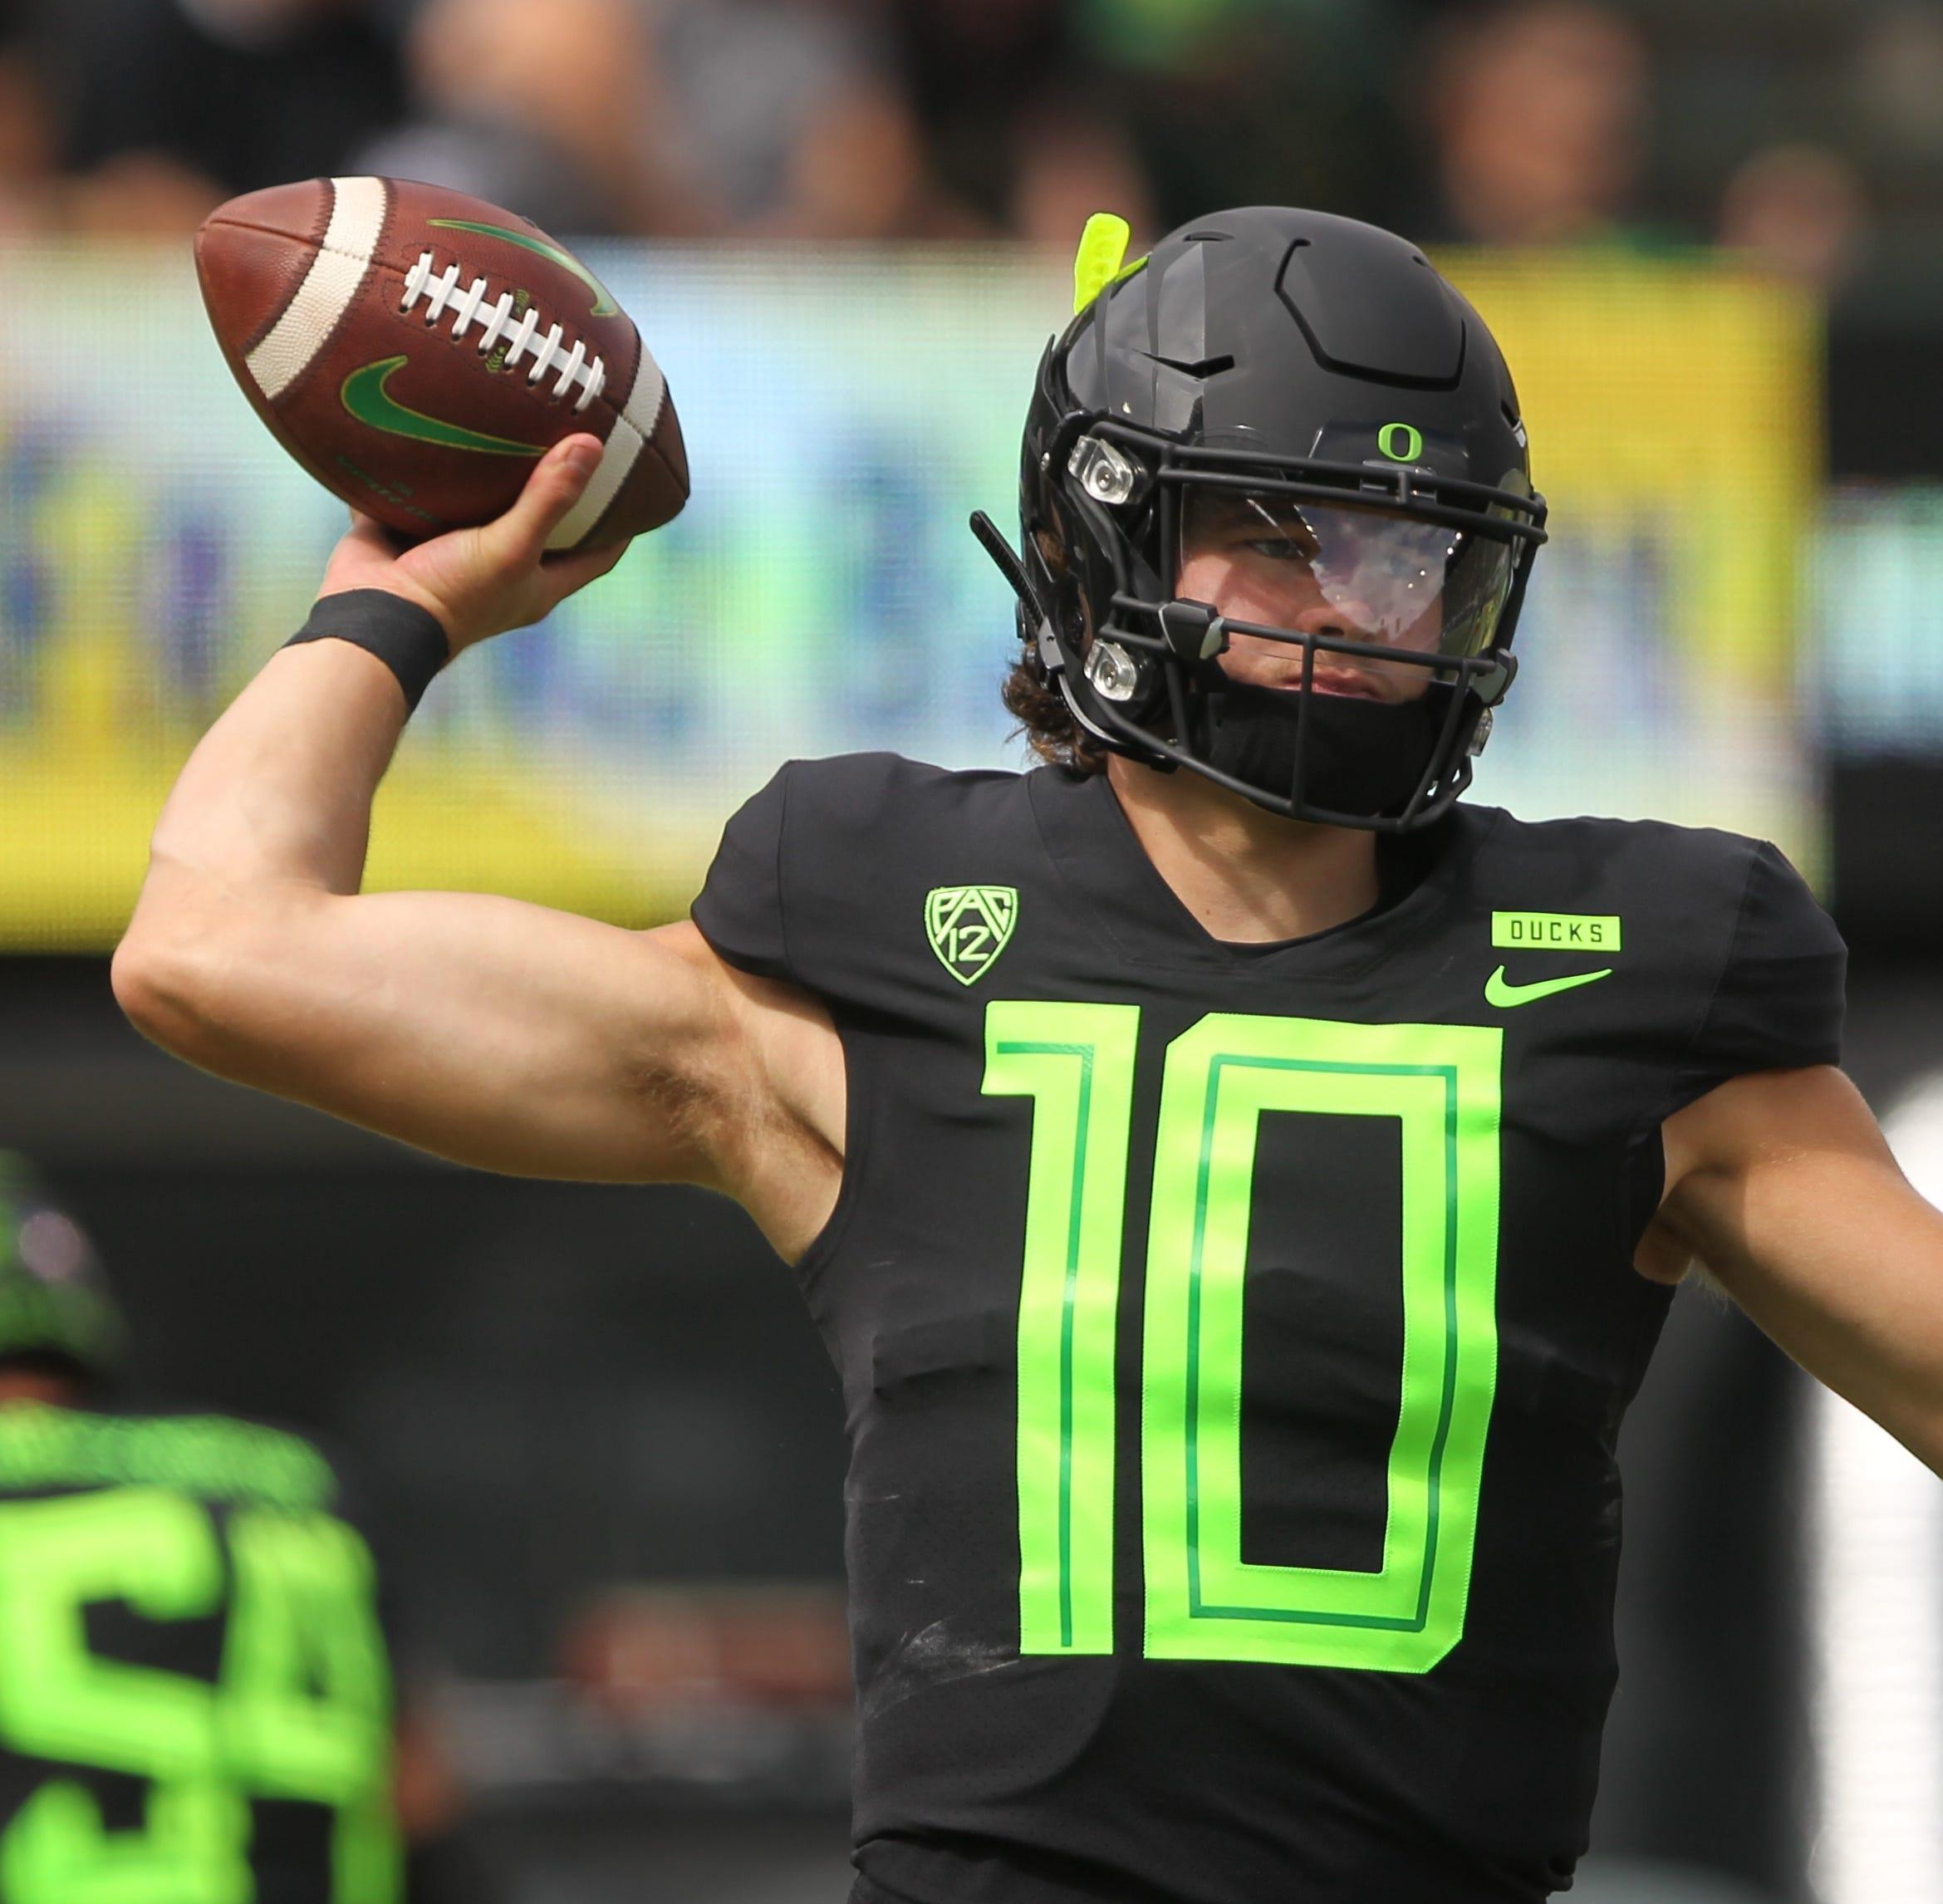 Oregon Ducks hold off San Jose State to remain unbeaten